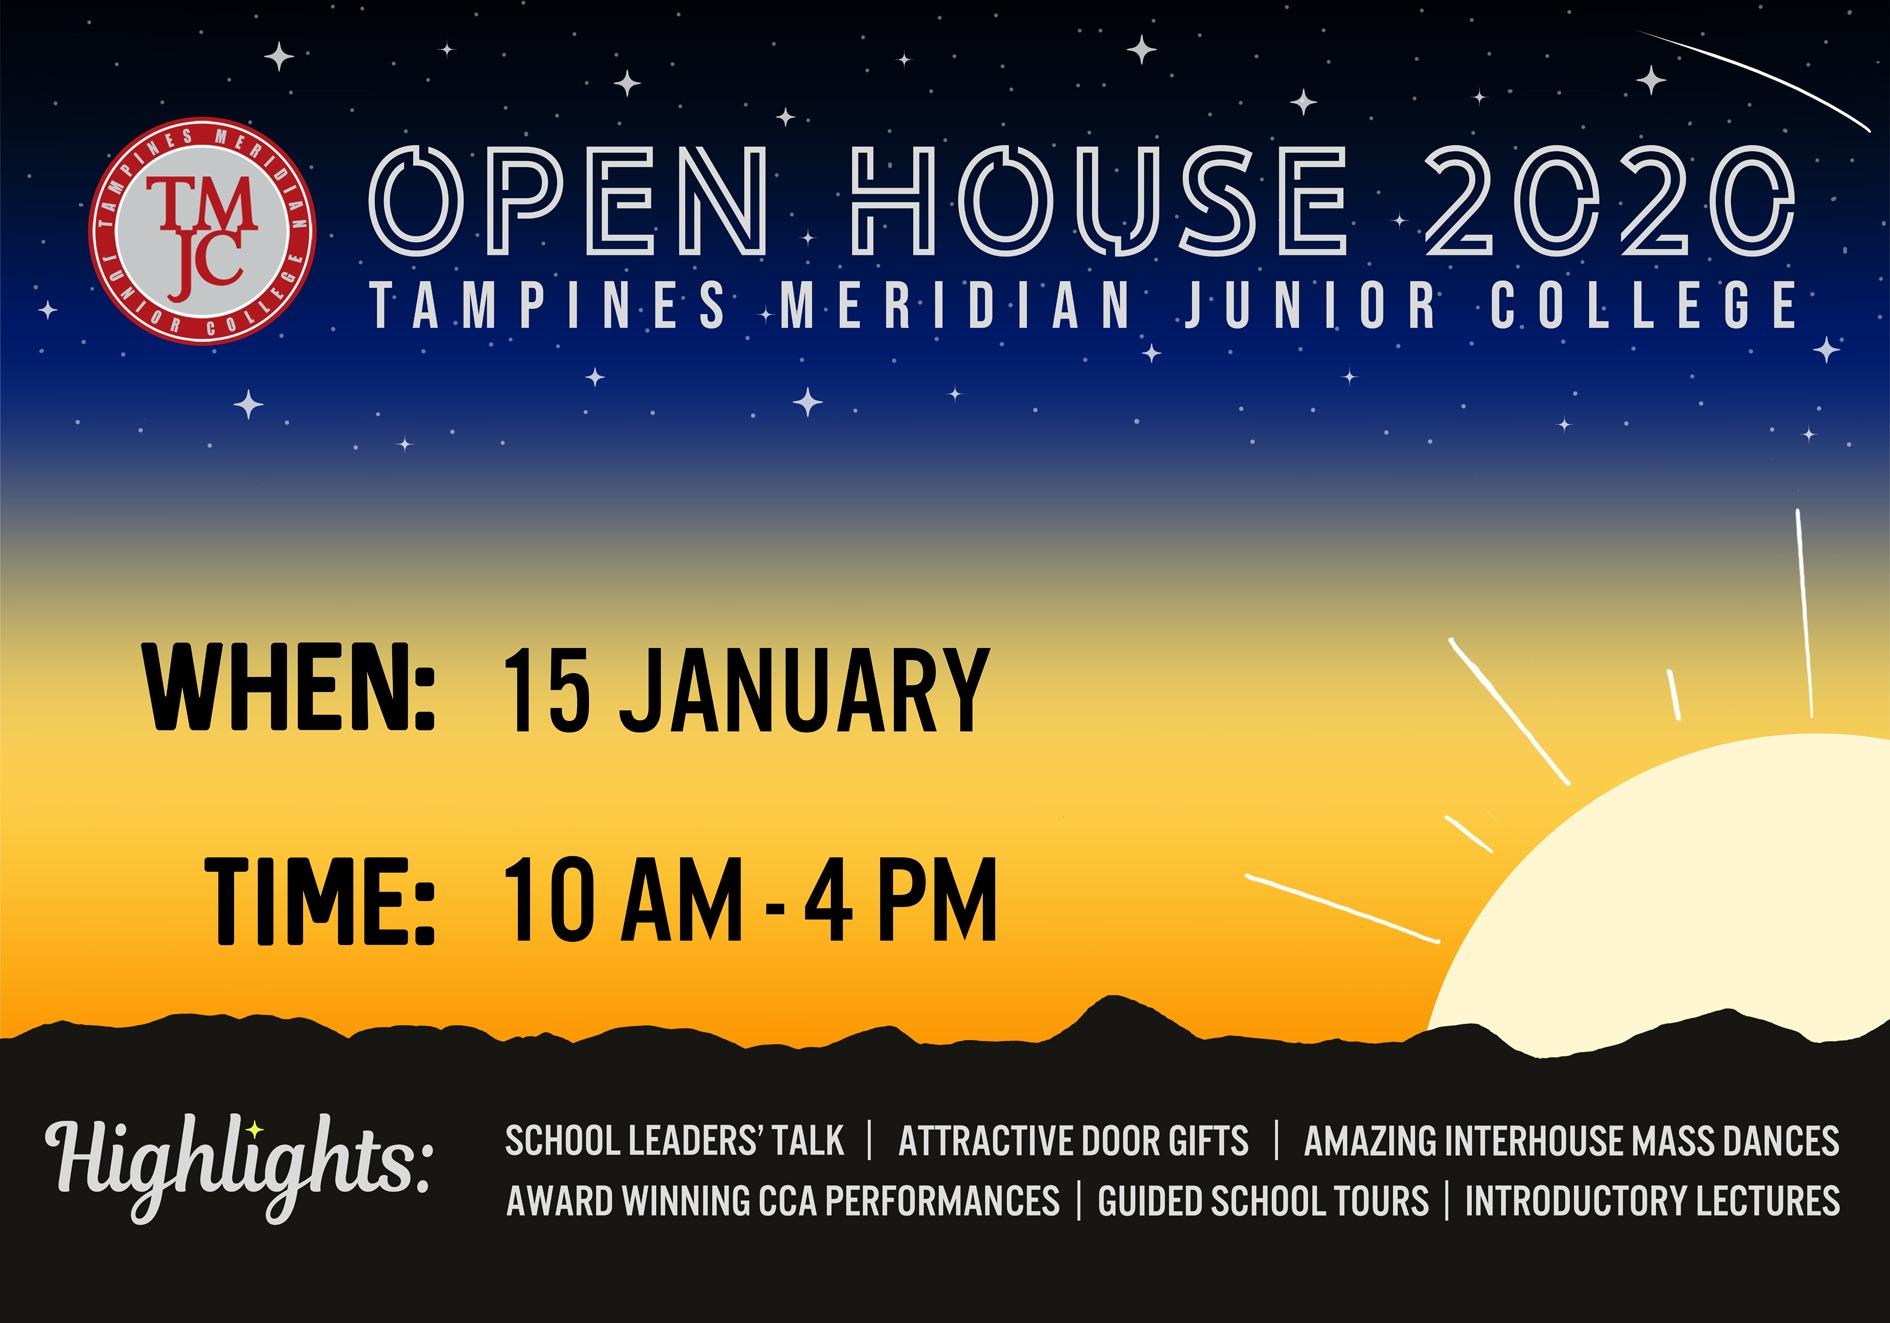 TMJC Open House 2020